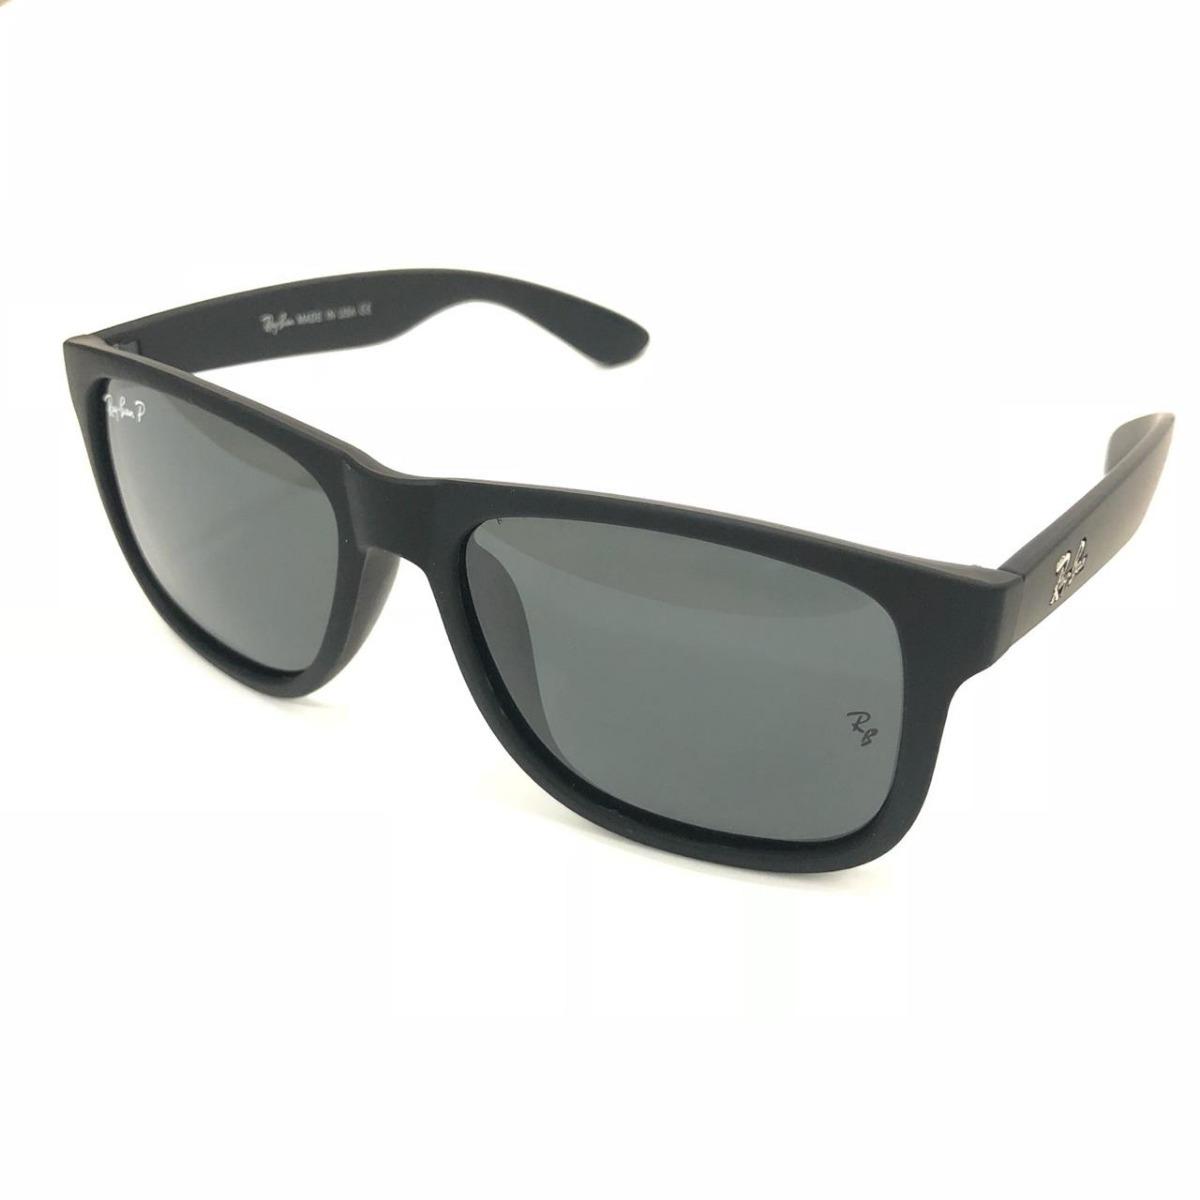 b03d93684 oculos de sol masculino justin ray ban polarizado rb4165 top. Carregando  zoom.